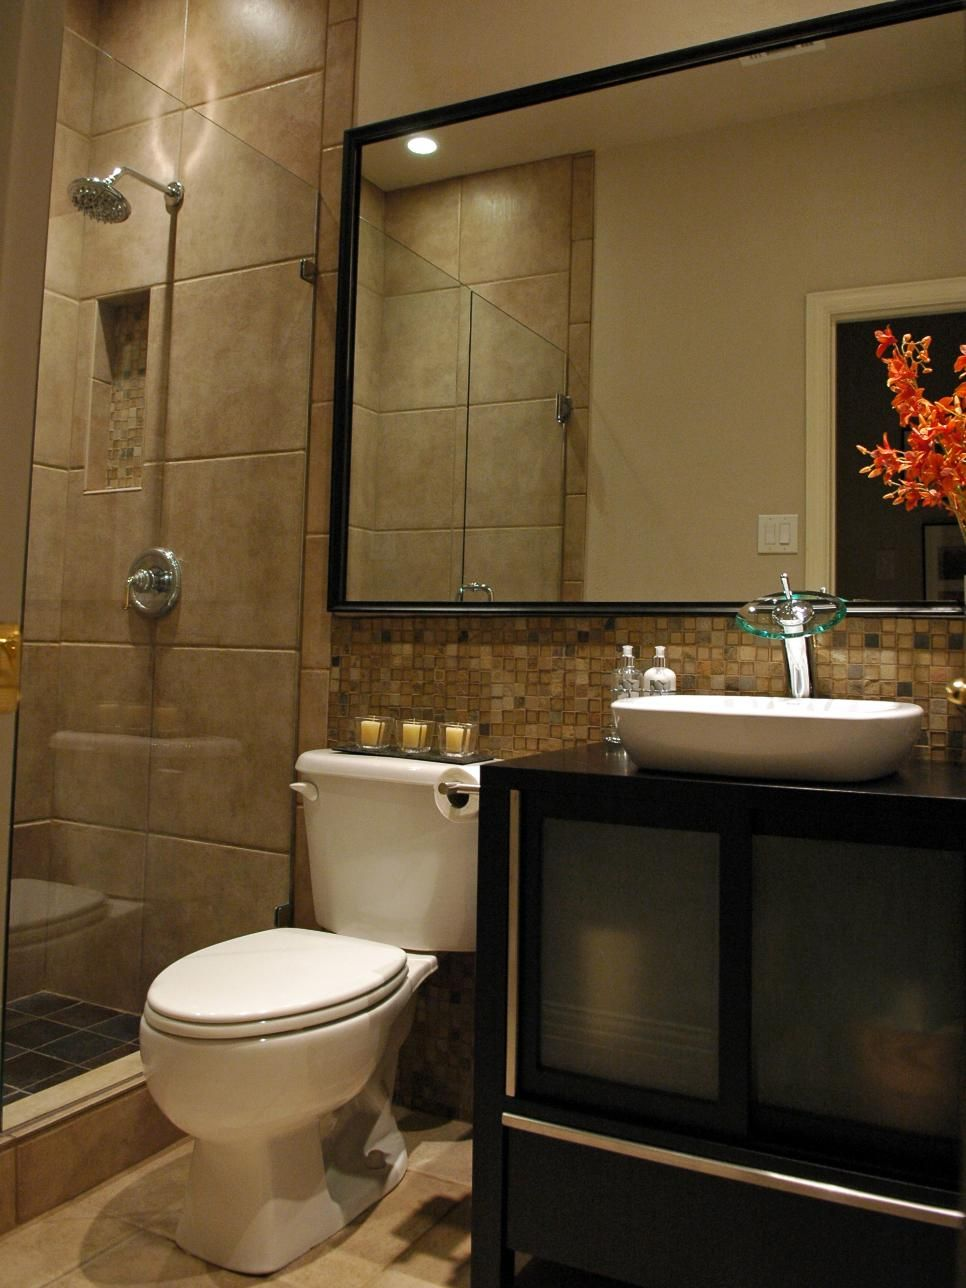 5 Must See Bathroom Transformations Bathroom Makeover Small Bathroom Remodel Budget Bathroom